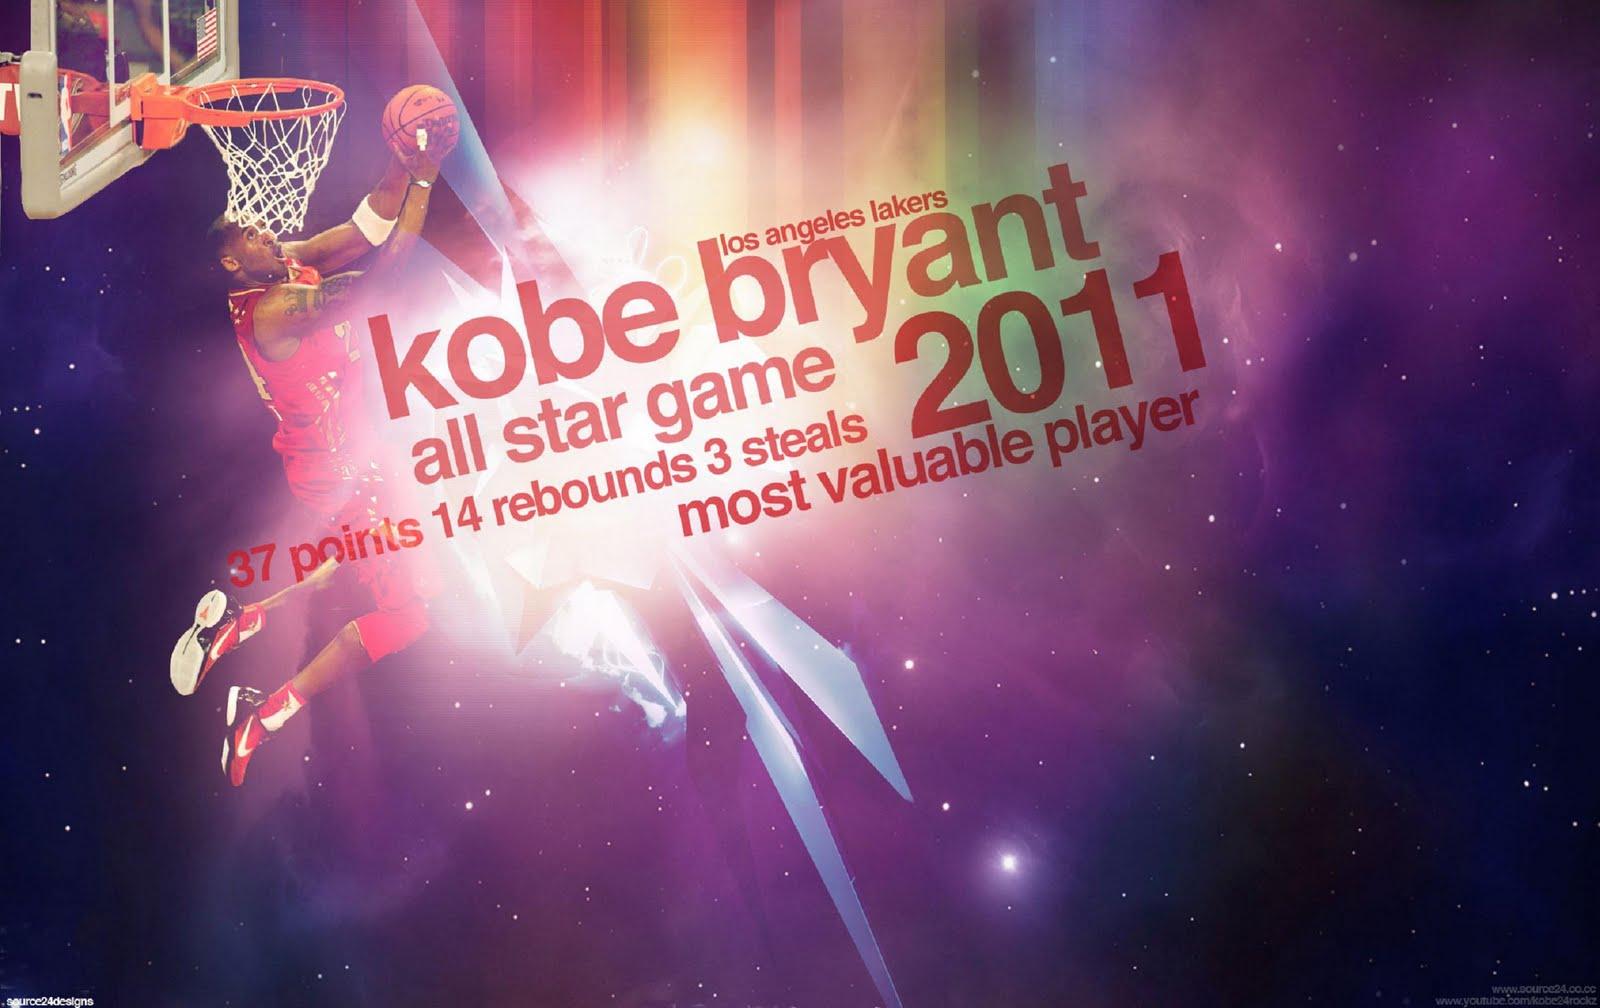 http://1.bp.blogspot.com/-VACbsI6DuYM/TiWEg1q6DMI/AAAAAAAAA9U/TzifUU3uUrY/s1600/Kobe-Bryant-2011-NBA-All-Star-MVP-Wallpaper.jpg